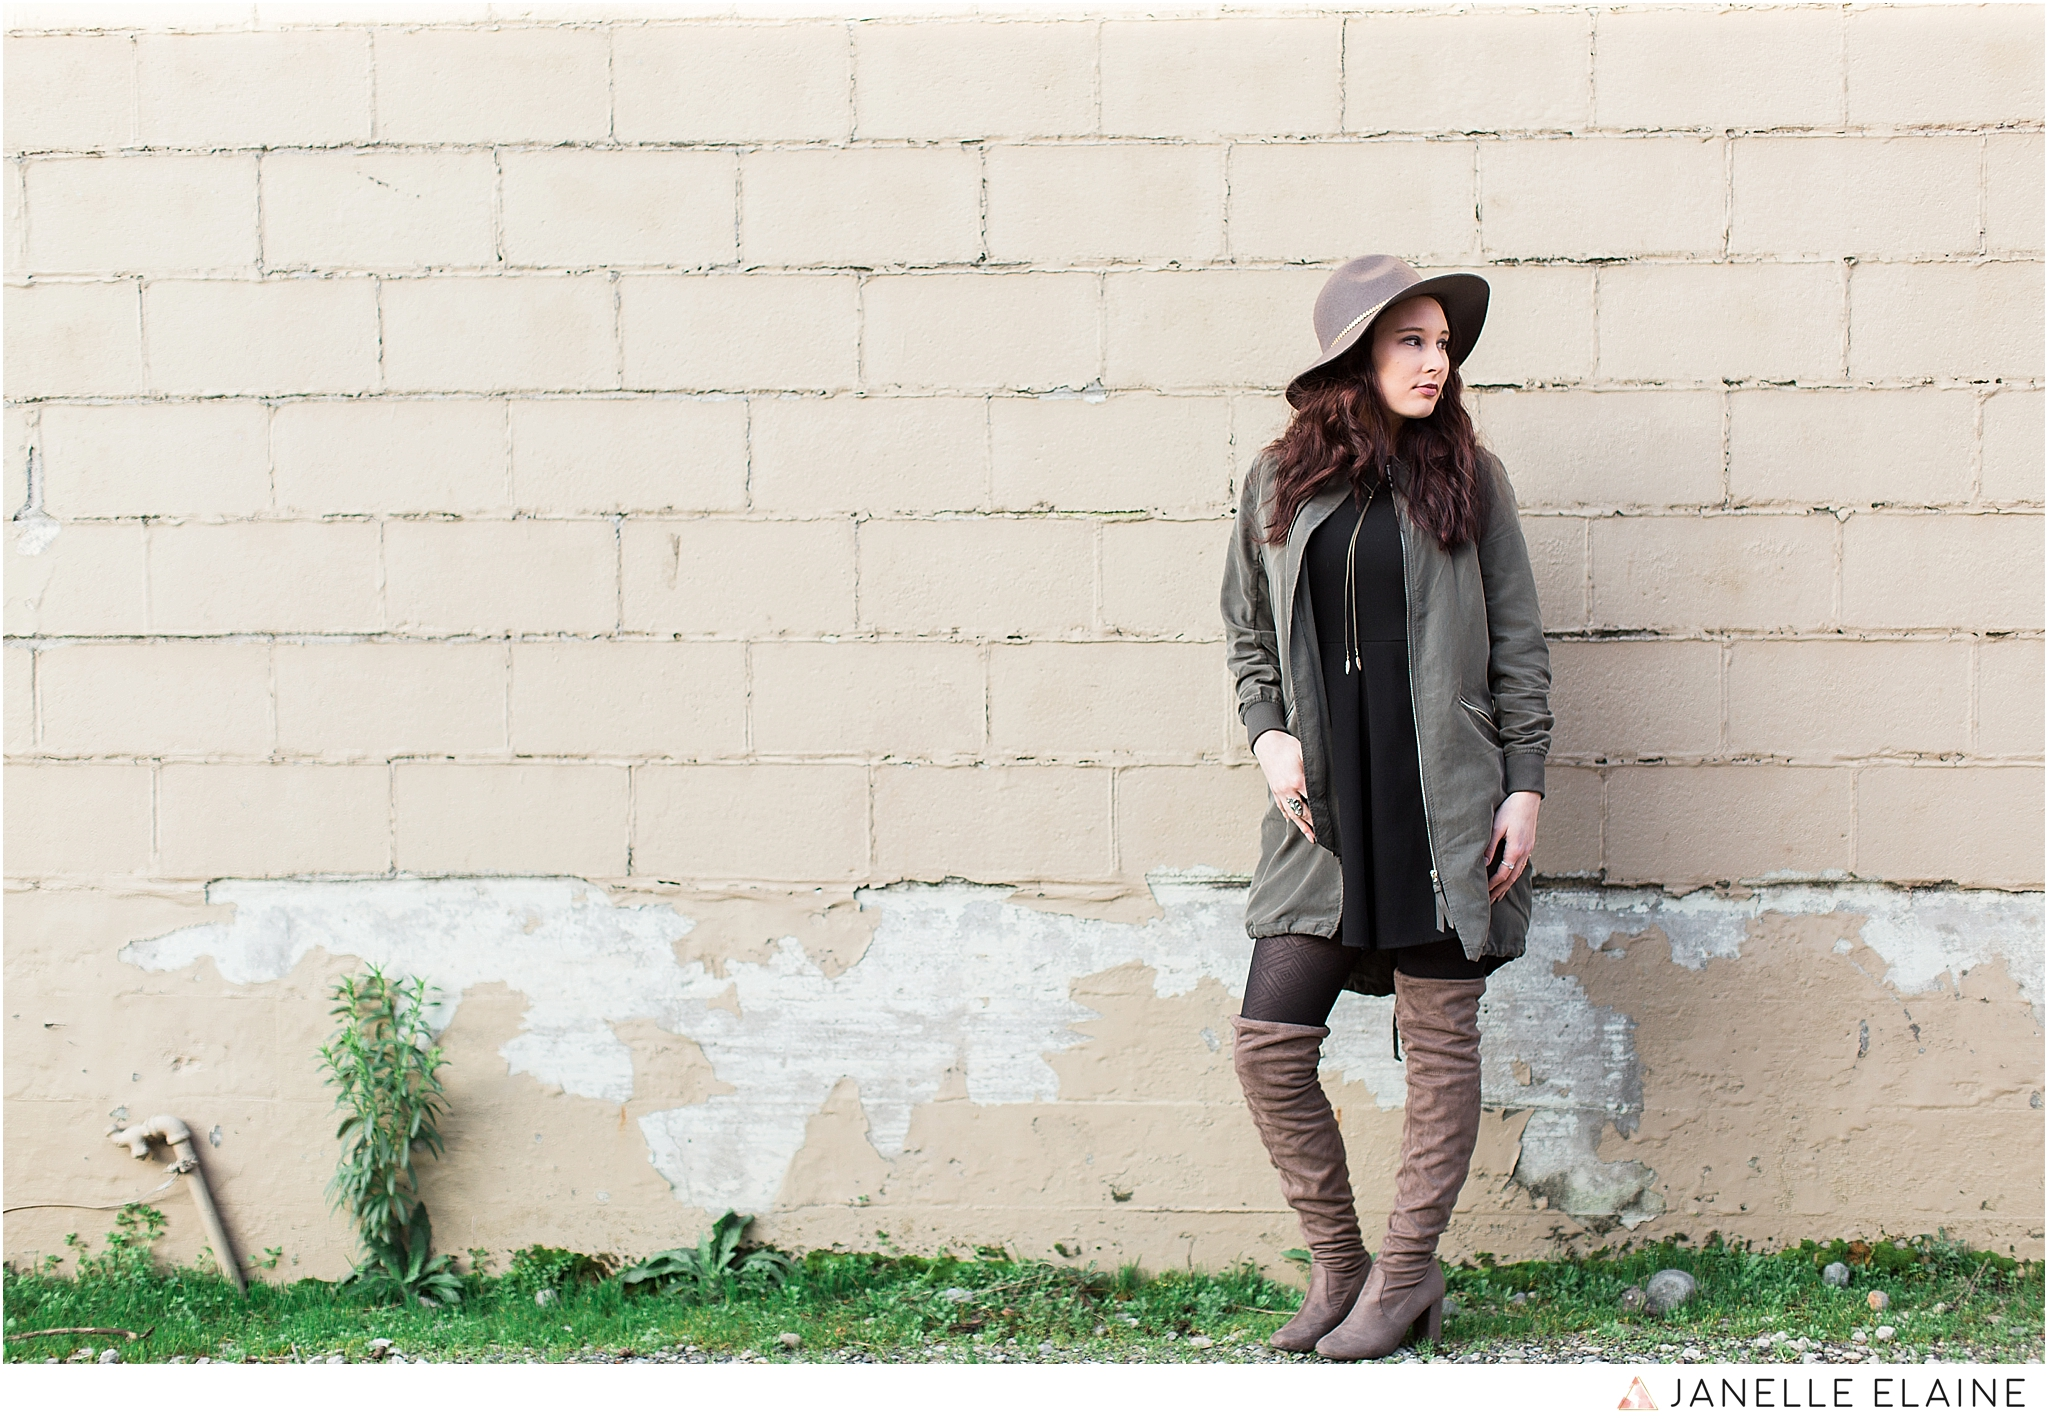 janelle elaine photography-seattle portrait photographer-washington-Hannah-16.jpg